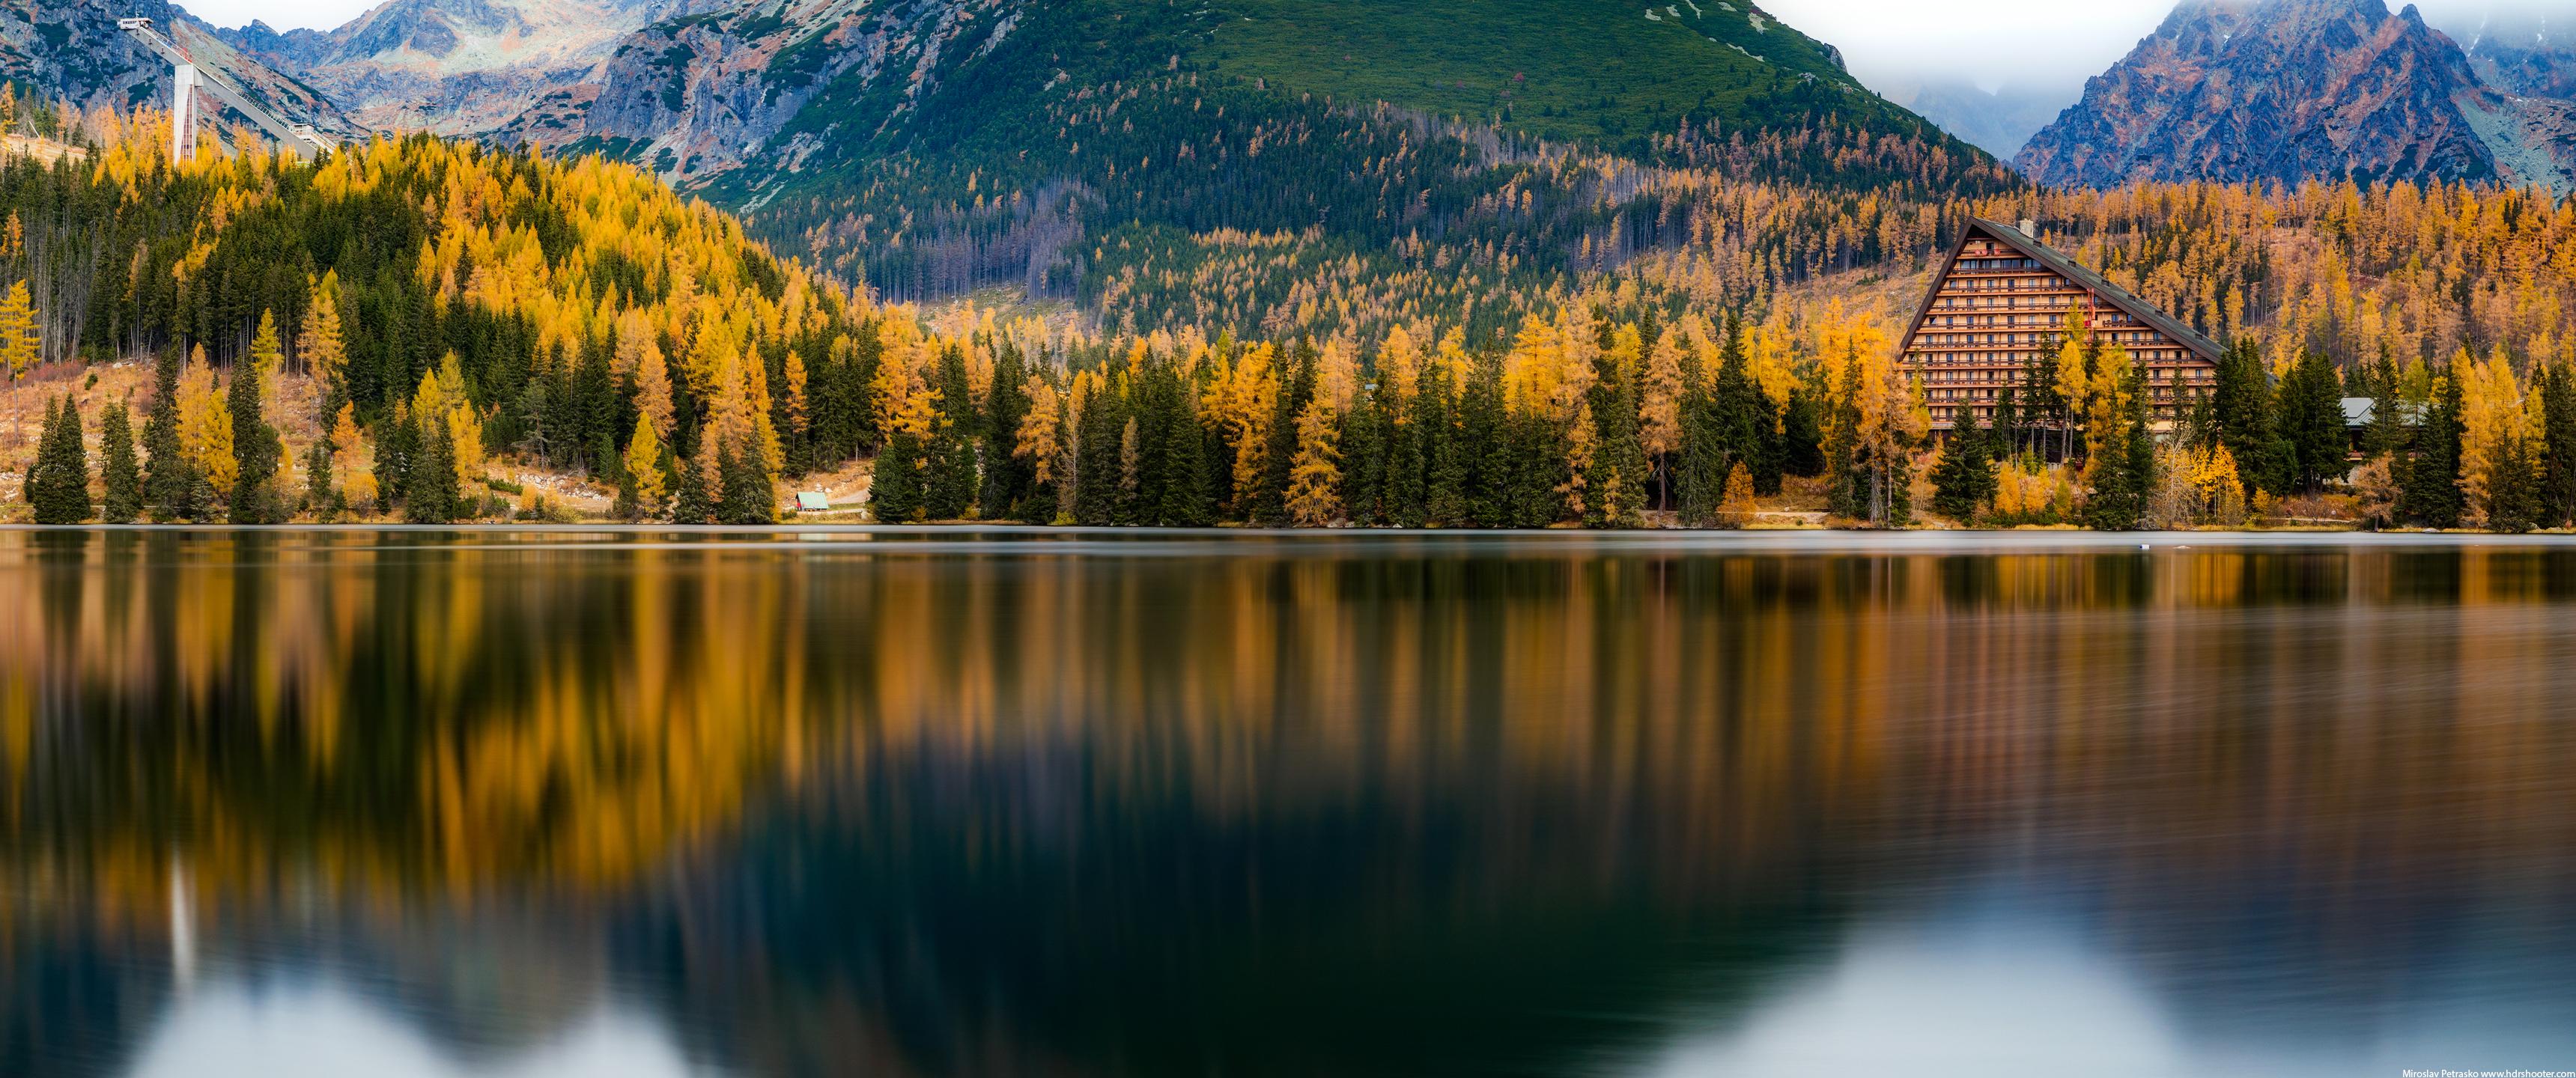 Autumn At The Lake Wallpaper